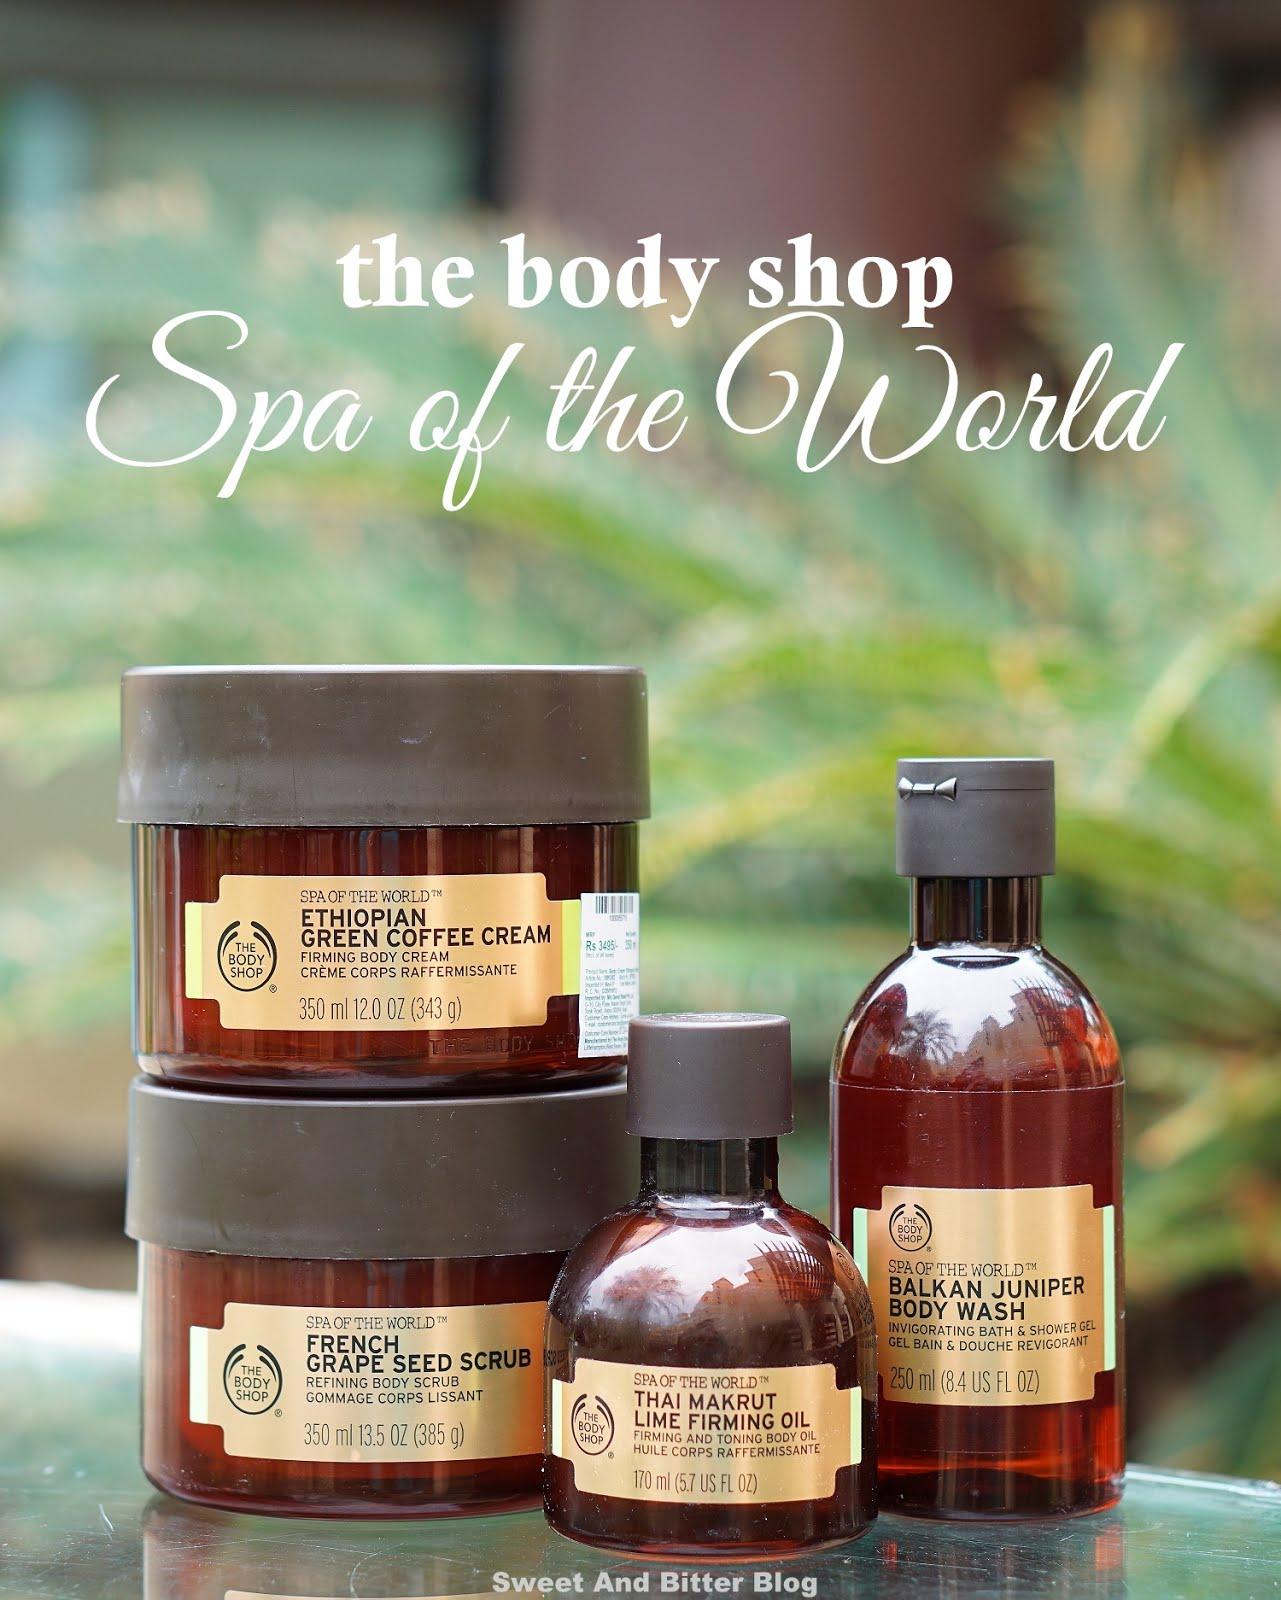 The Body Shop Spa of the World French Grape Seed Scrub, Ethiopian Green Coffee Cream, Thai Makrut Lime Firming Oil, Balkan Juniper Body Wash Review India